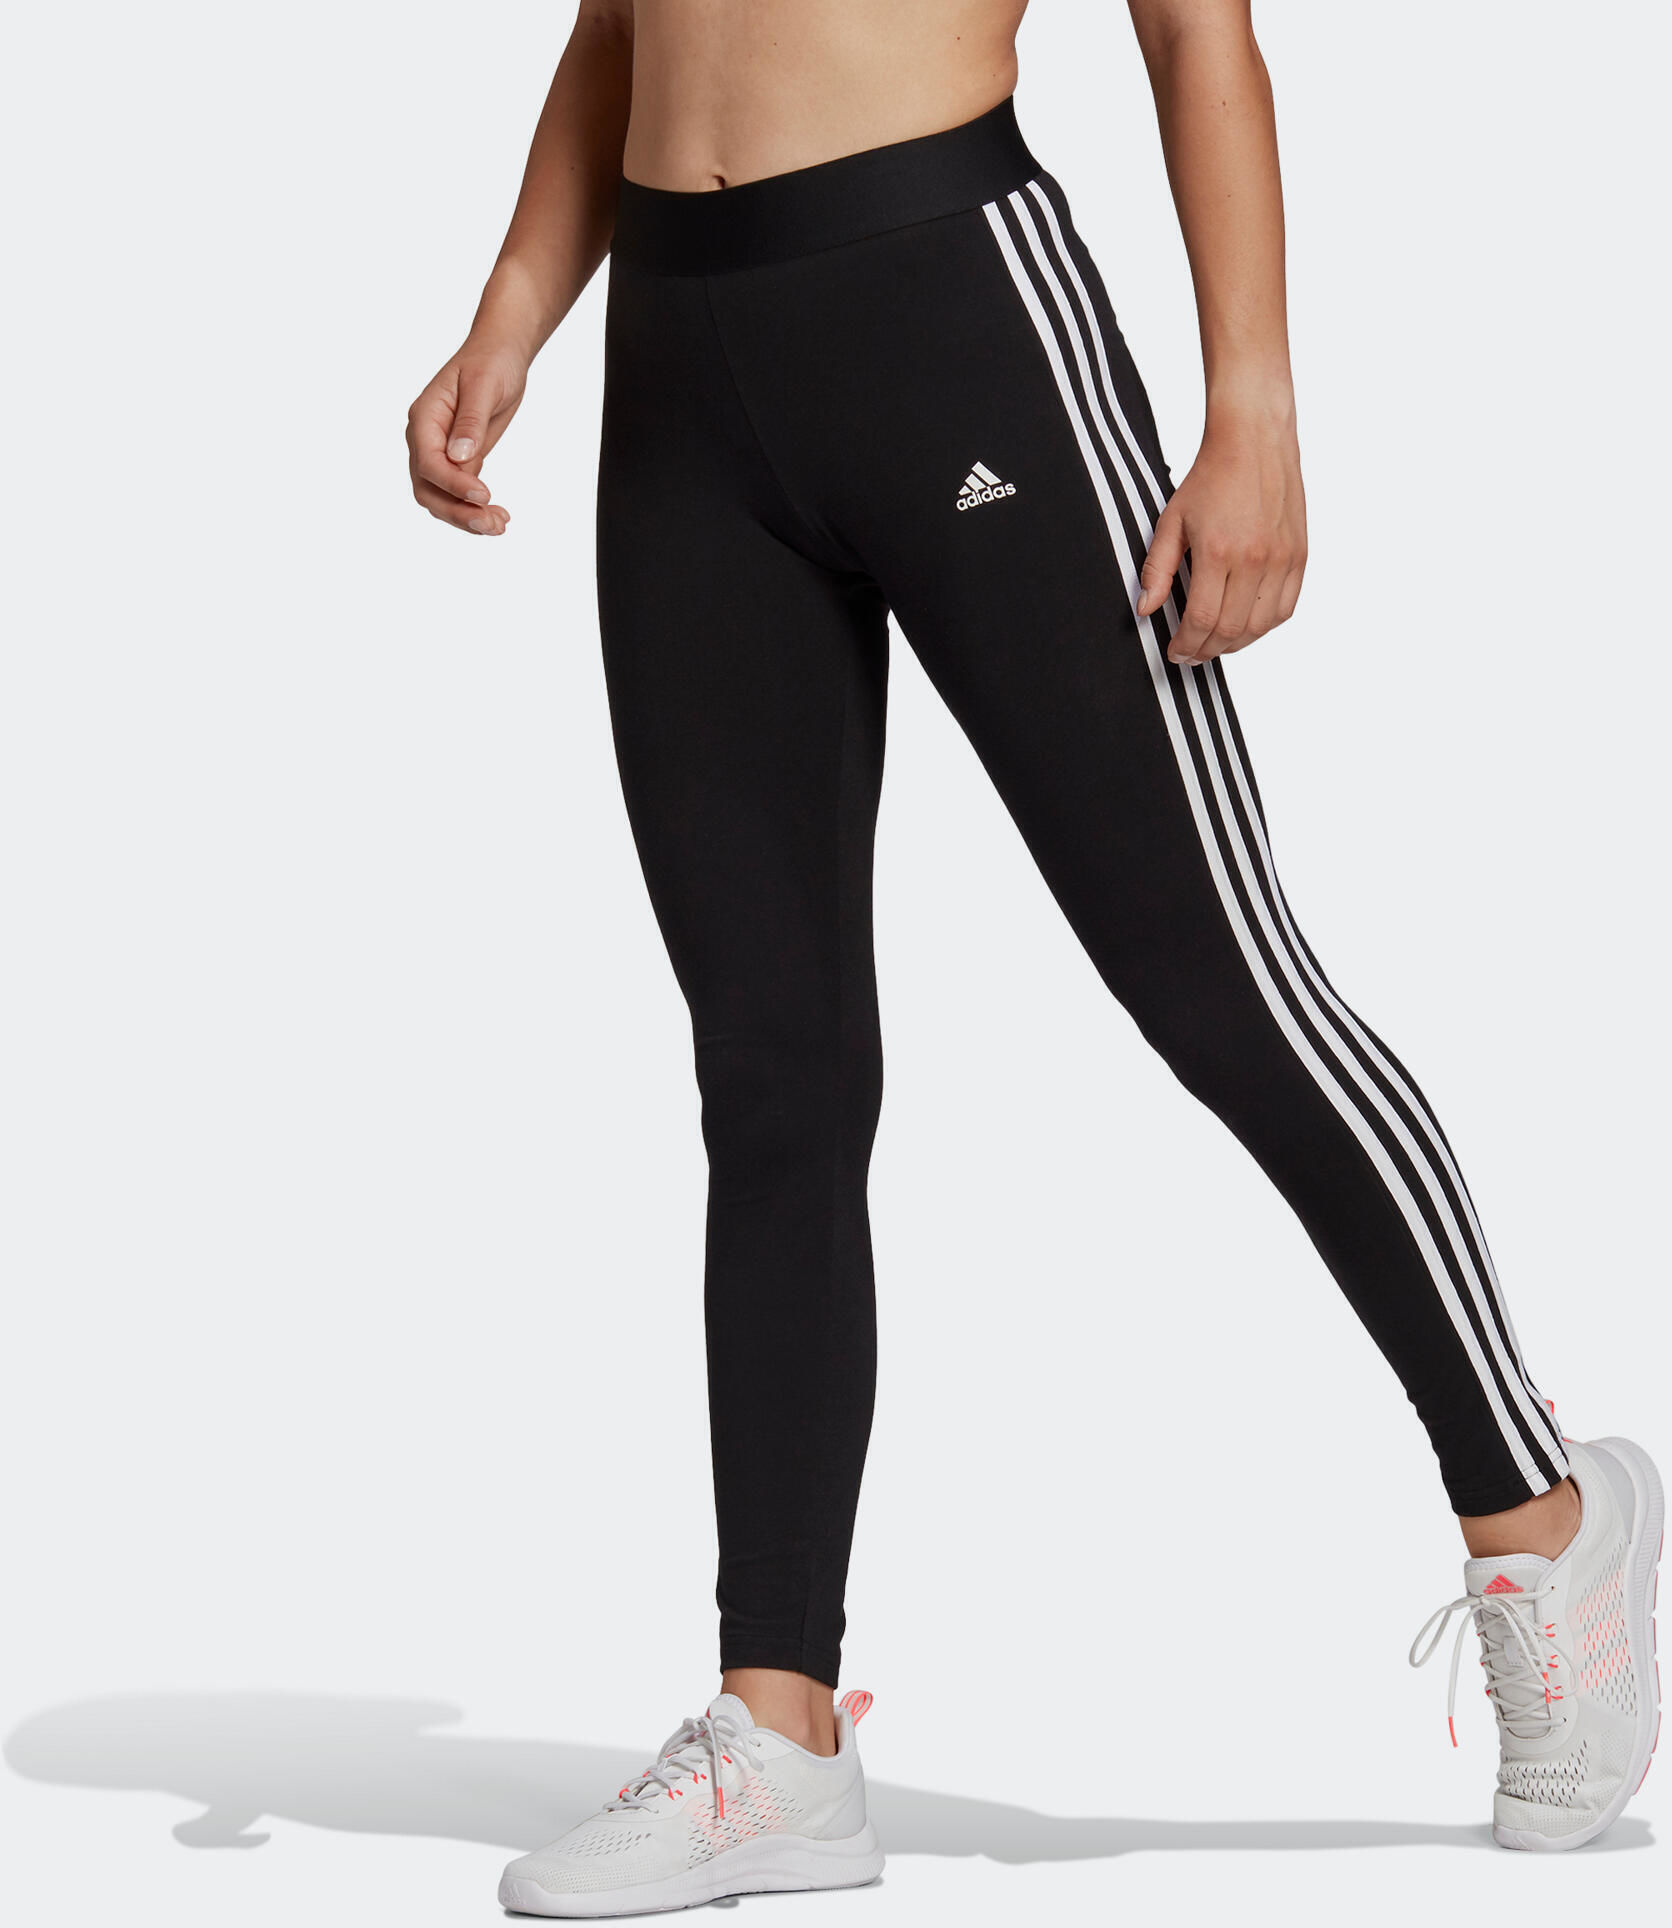 Legginsy fitness damskie Adidas